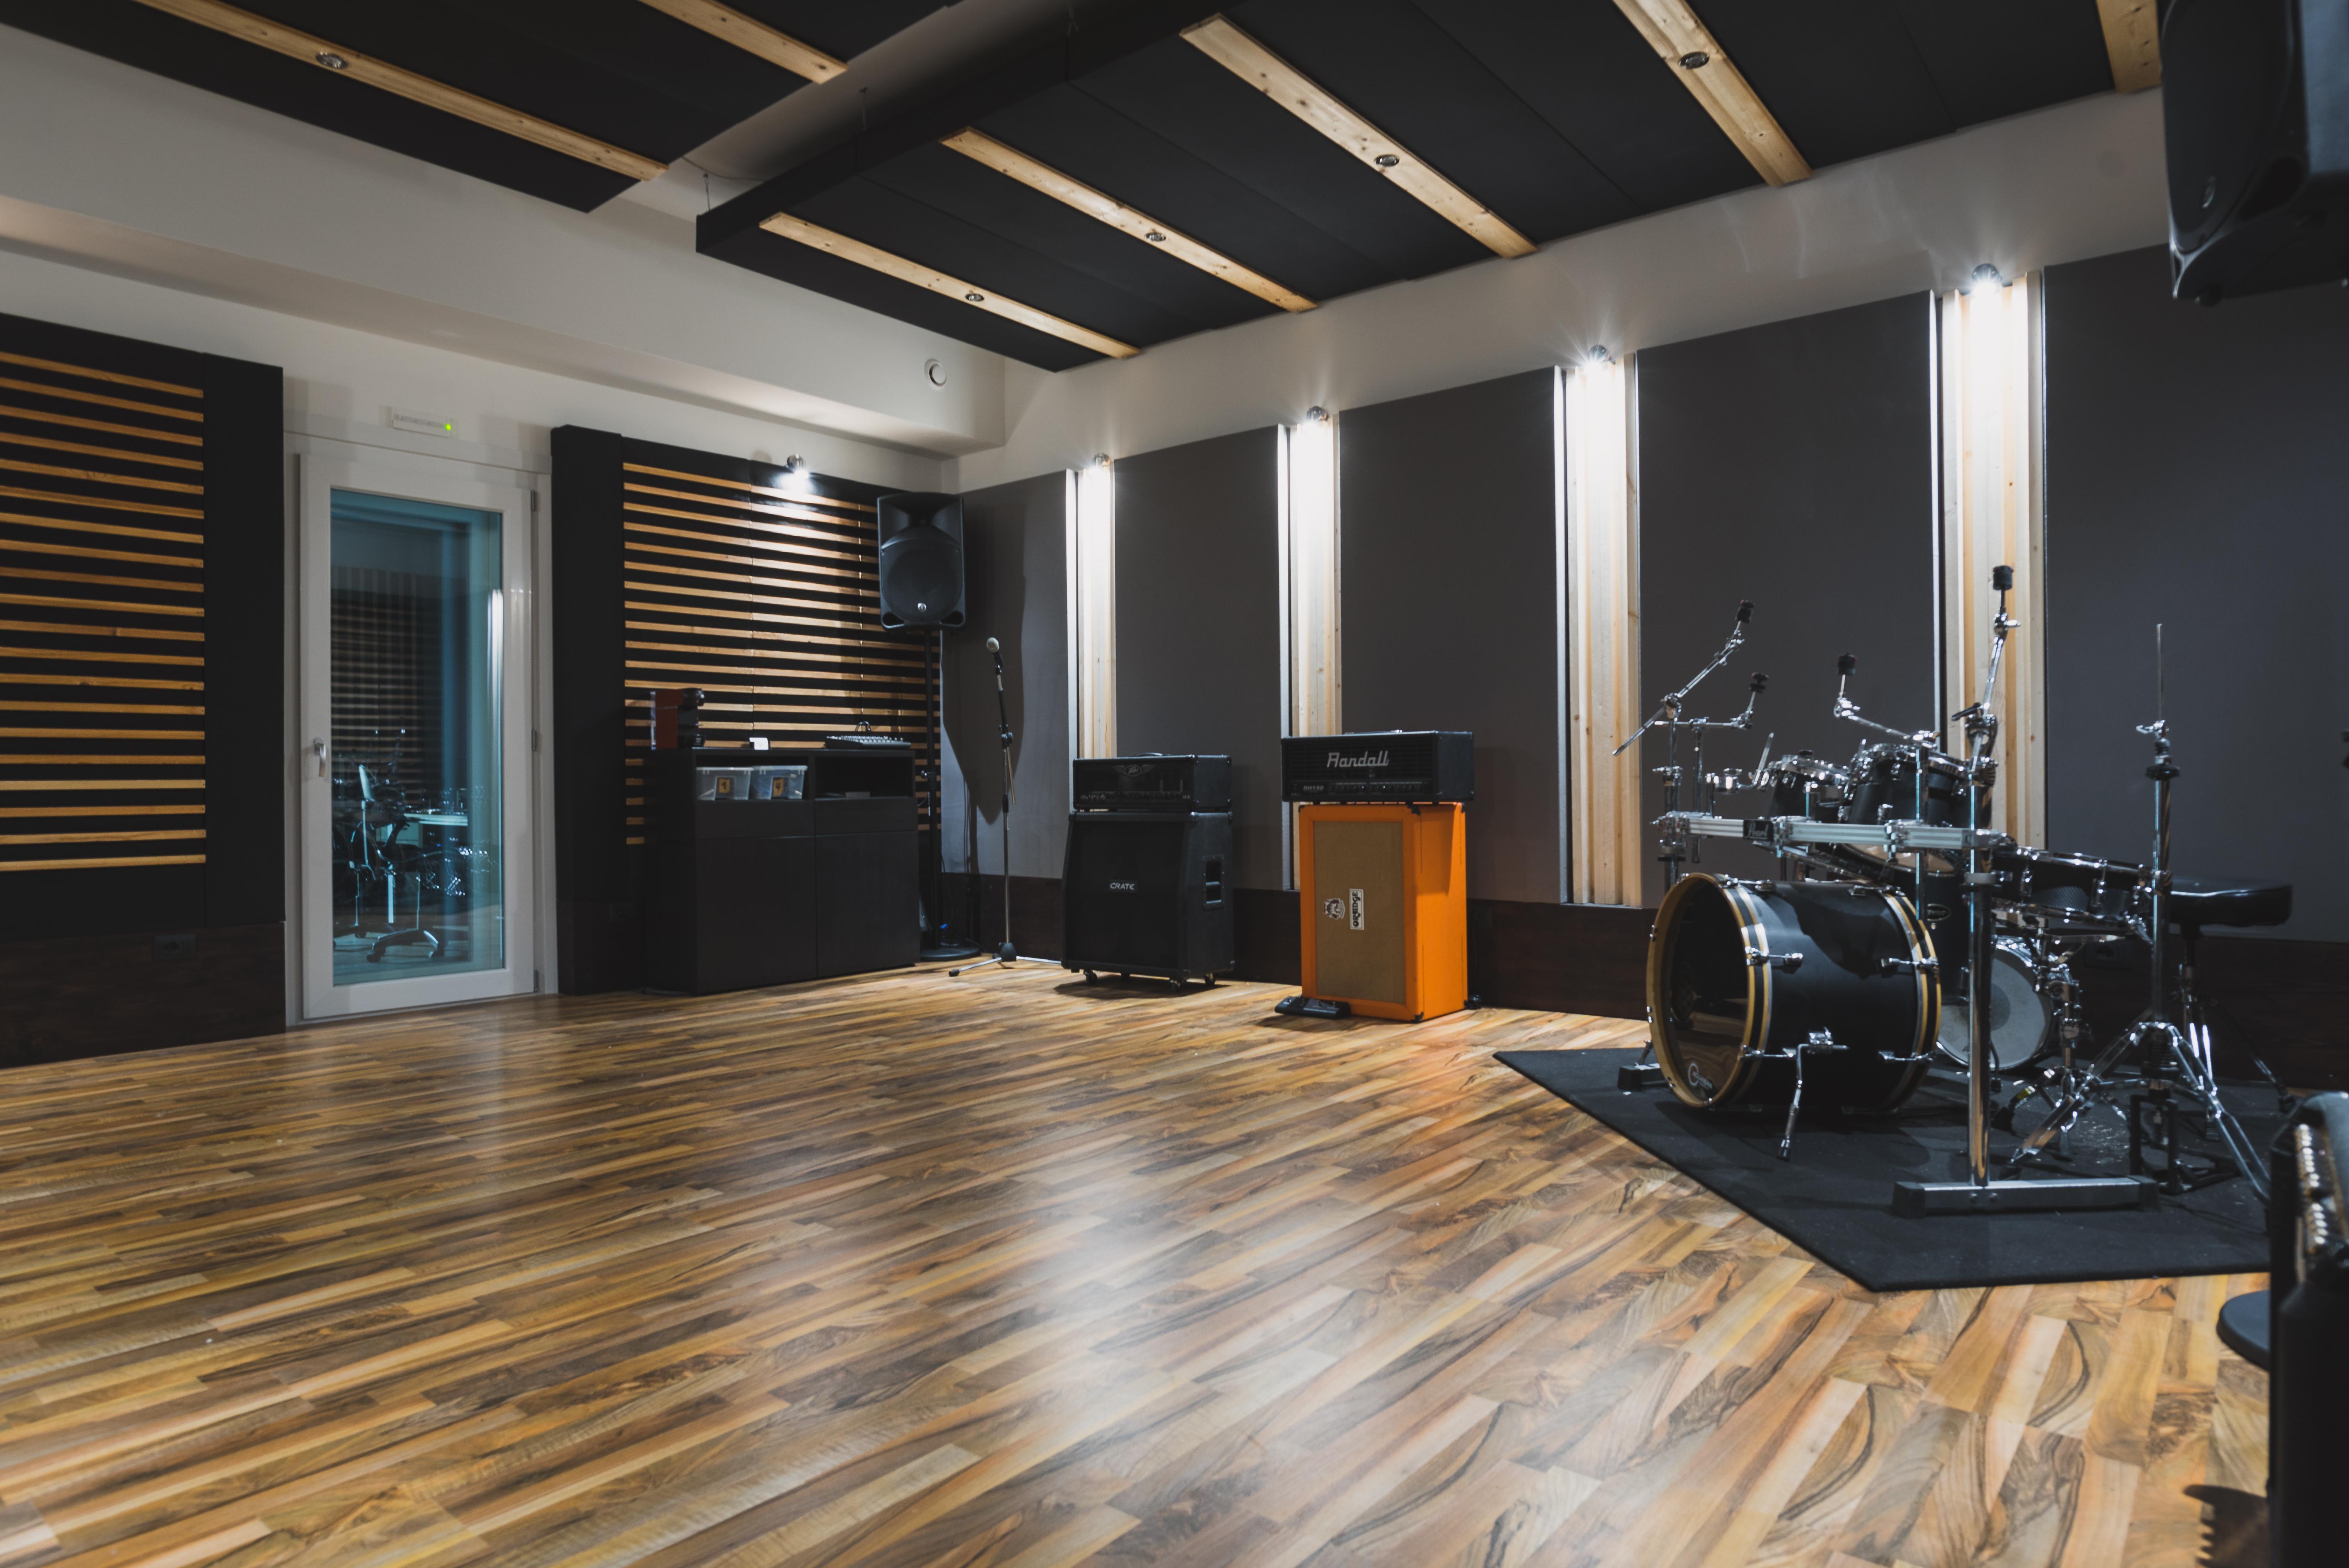 Nuova Sala Prove/Ripresa Art Distillery Studios